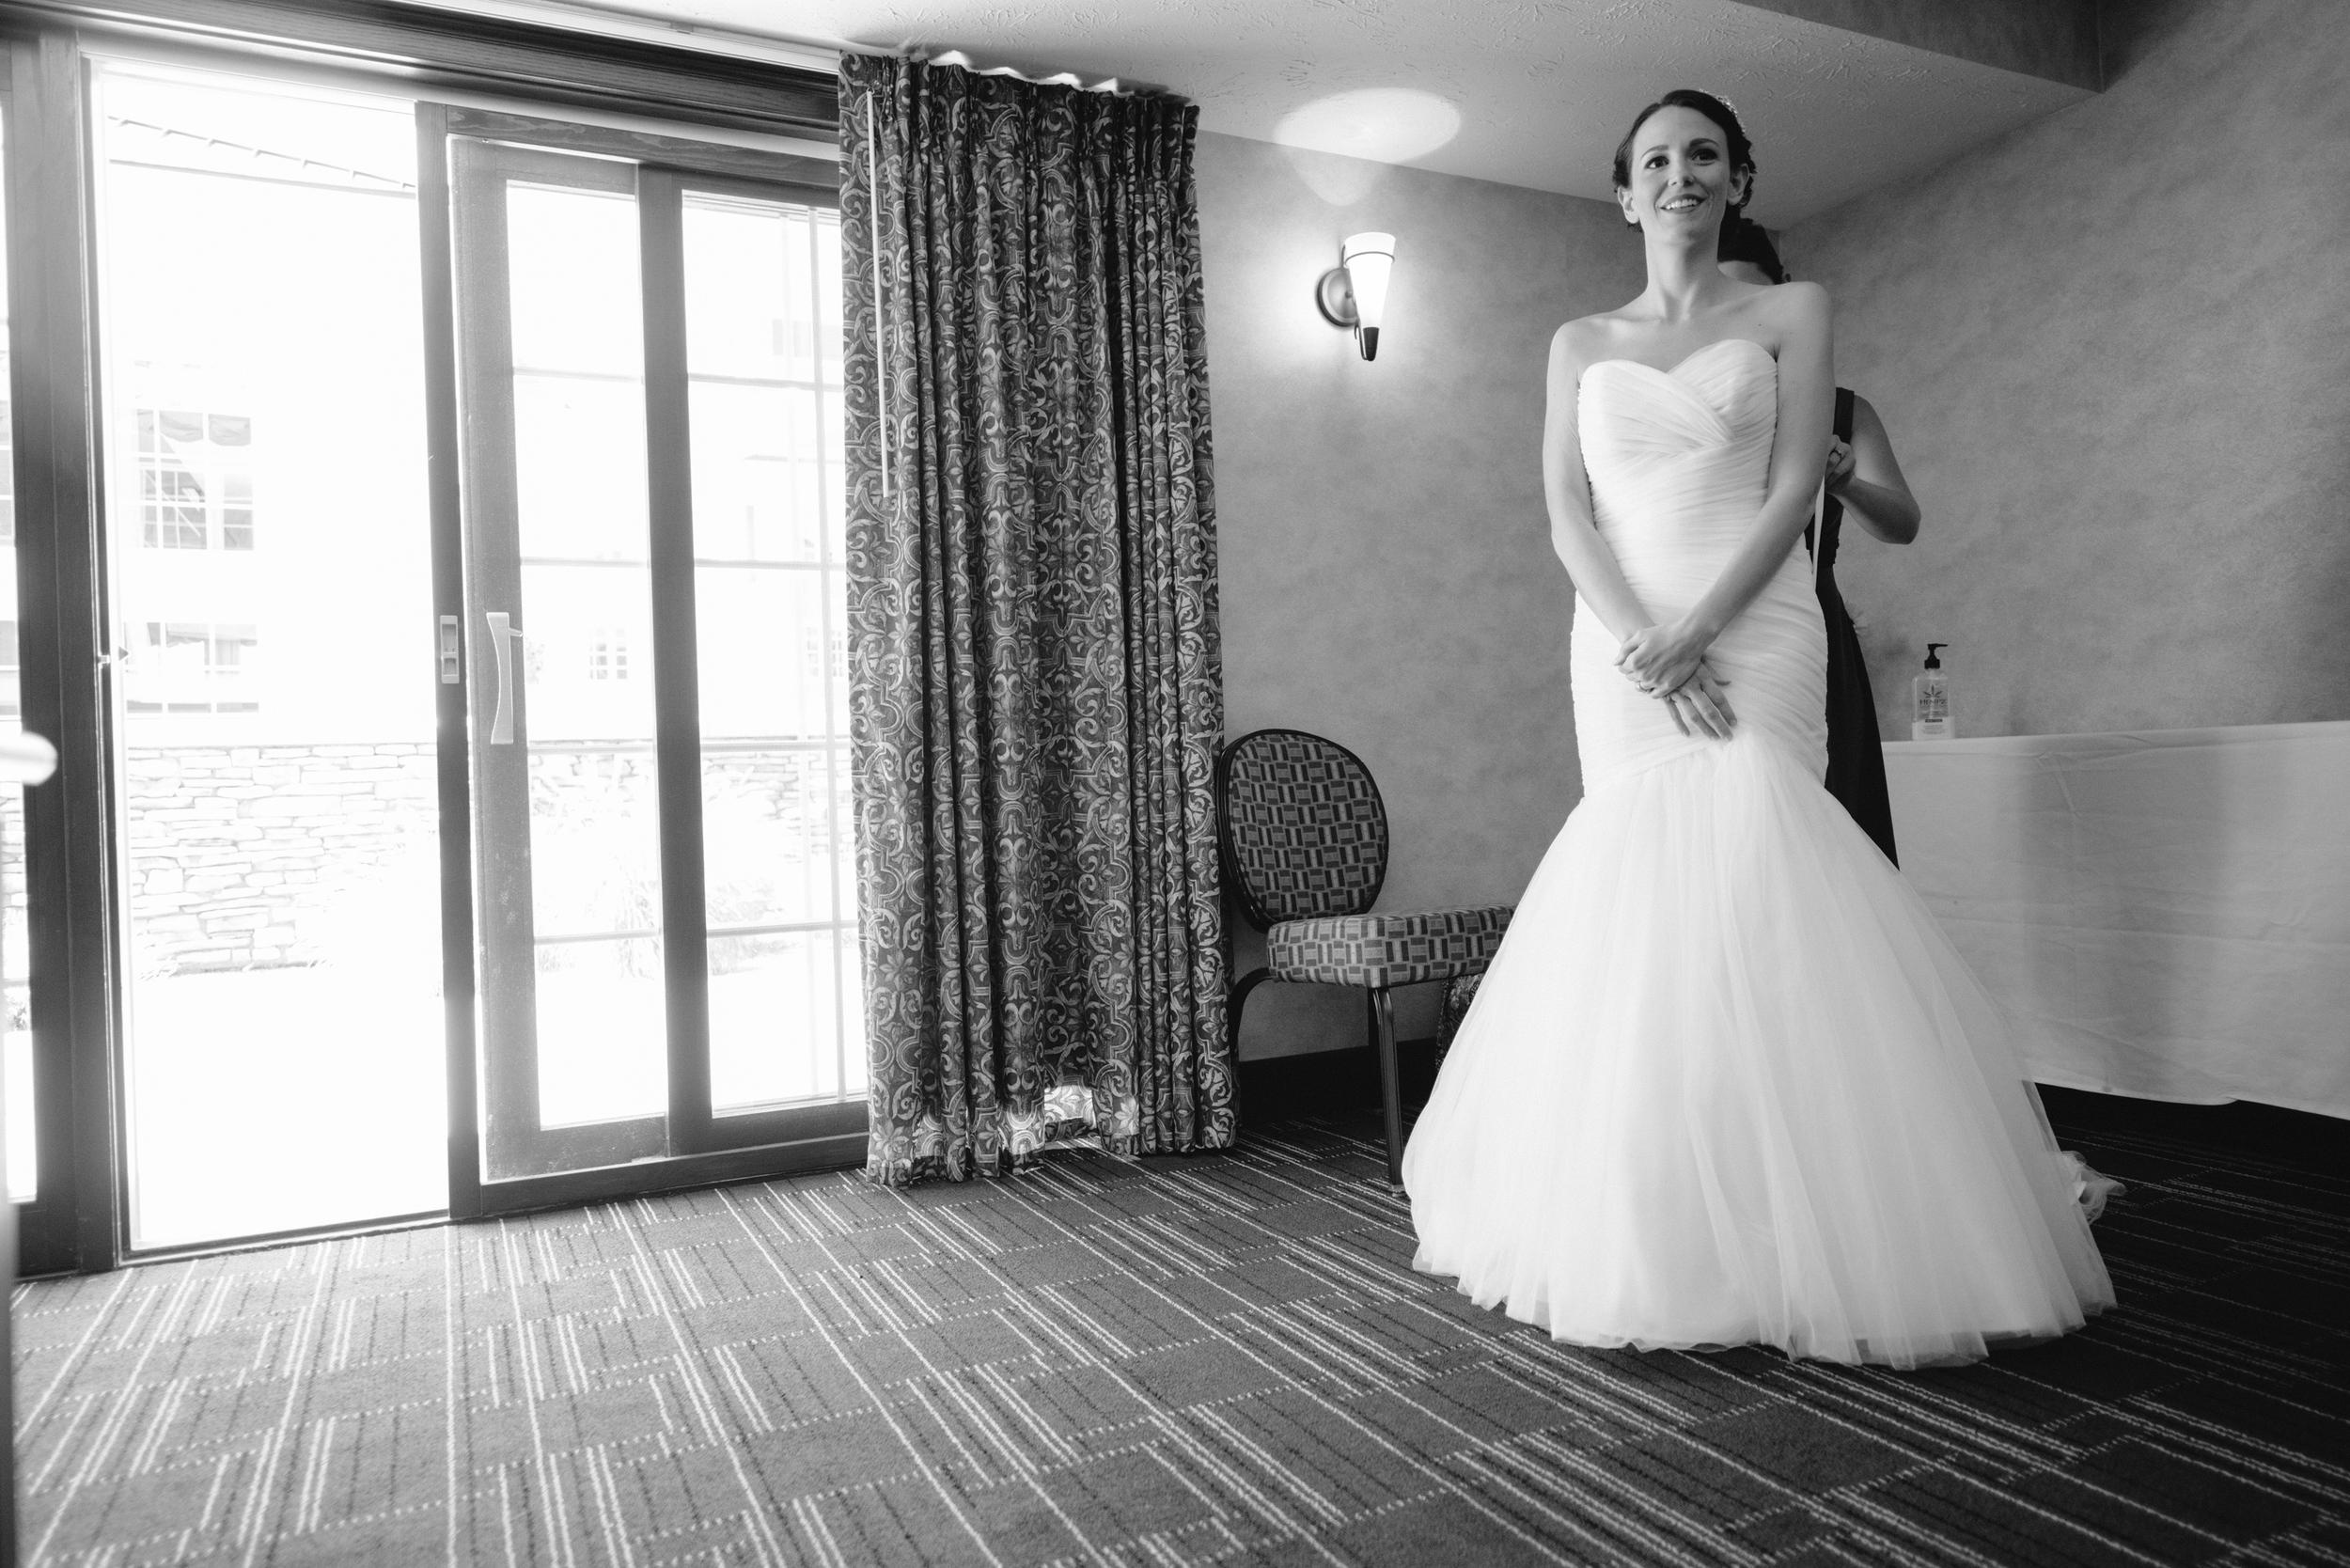 Matt_Swetel_Photography_Erin_and_Jeff_married008.jpg